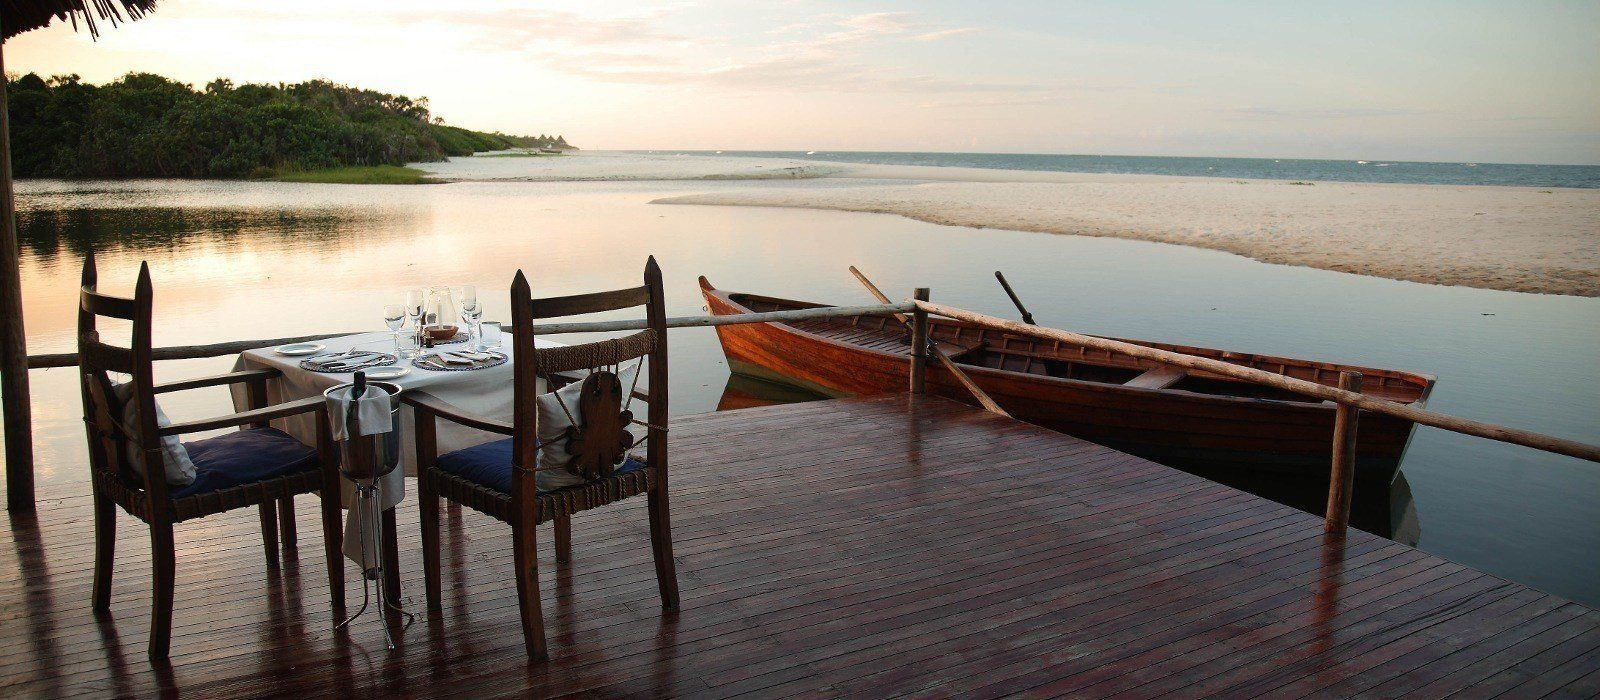 Tansania: Wahre Wildnis, unberührtes Juwel & Inselparadies Urlaub 7